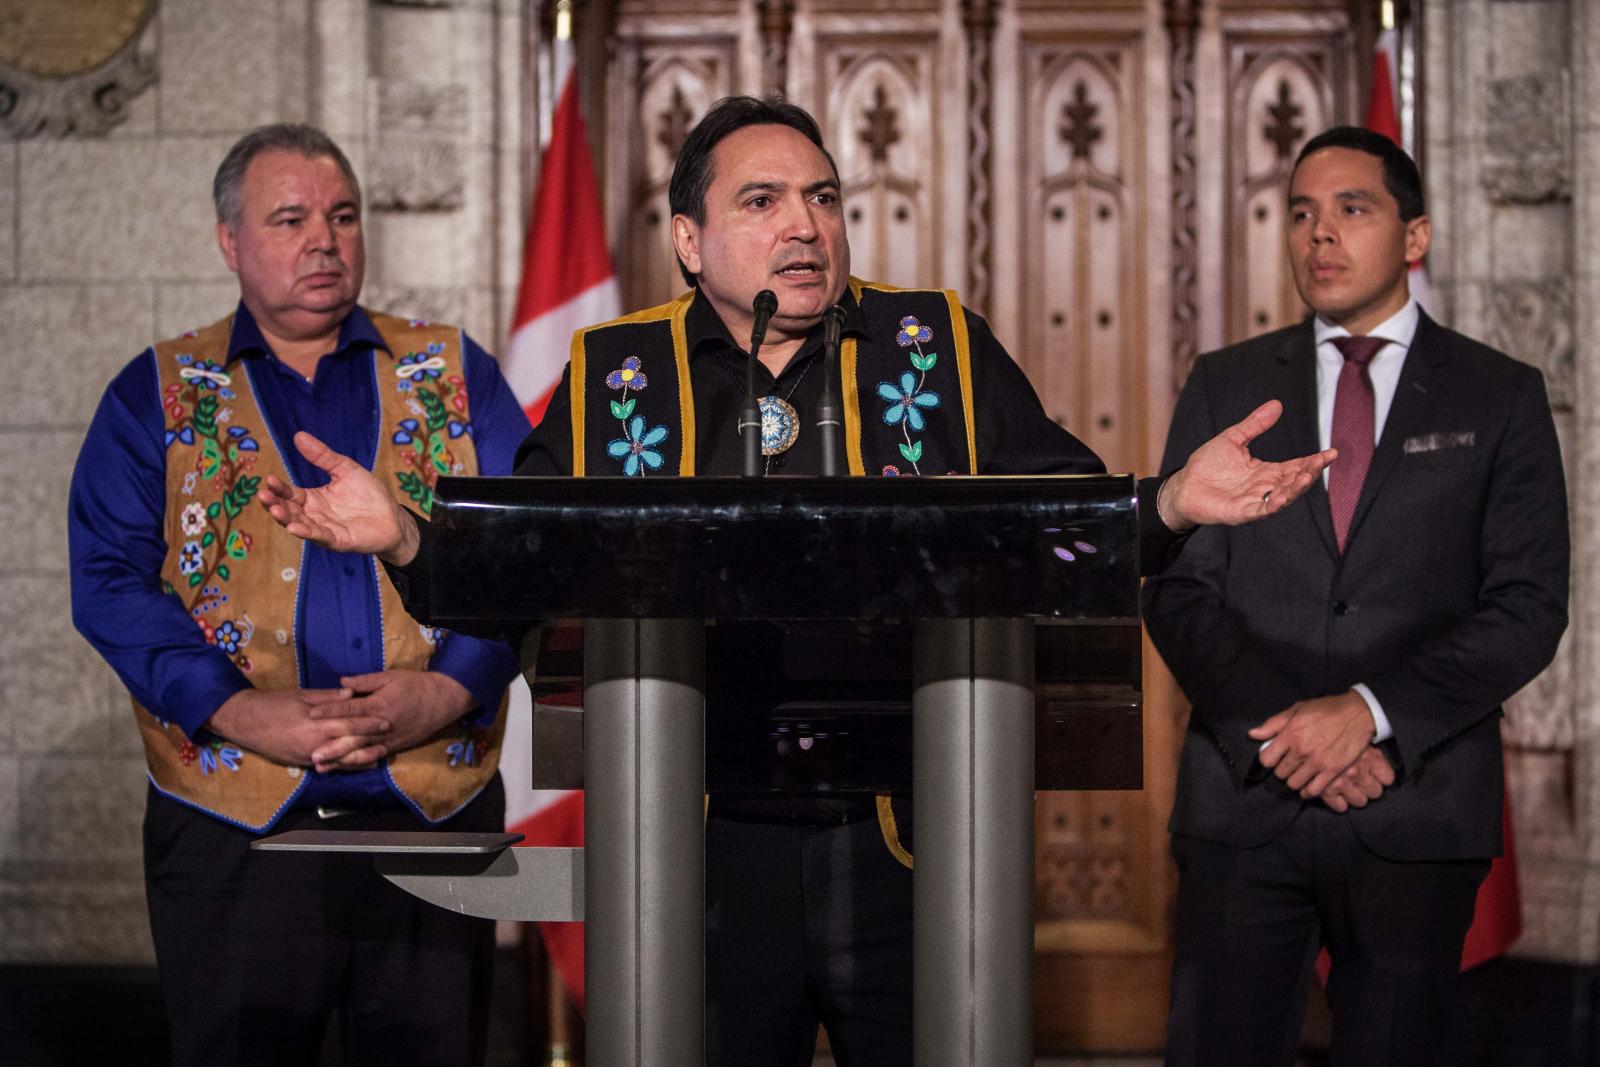 Alberta Hosts Summer Meeting of Canada's Premiers in Edmonton